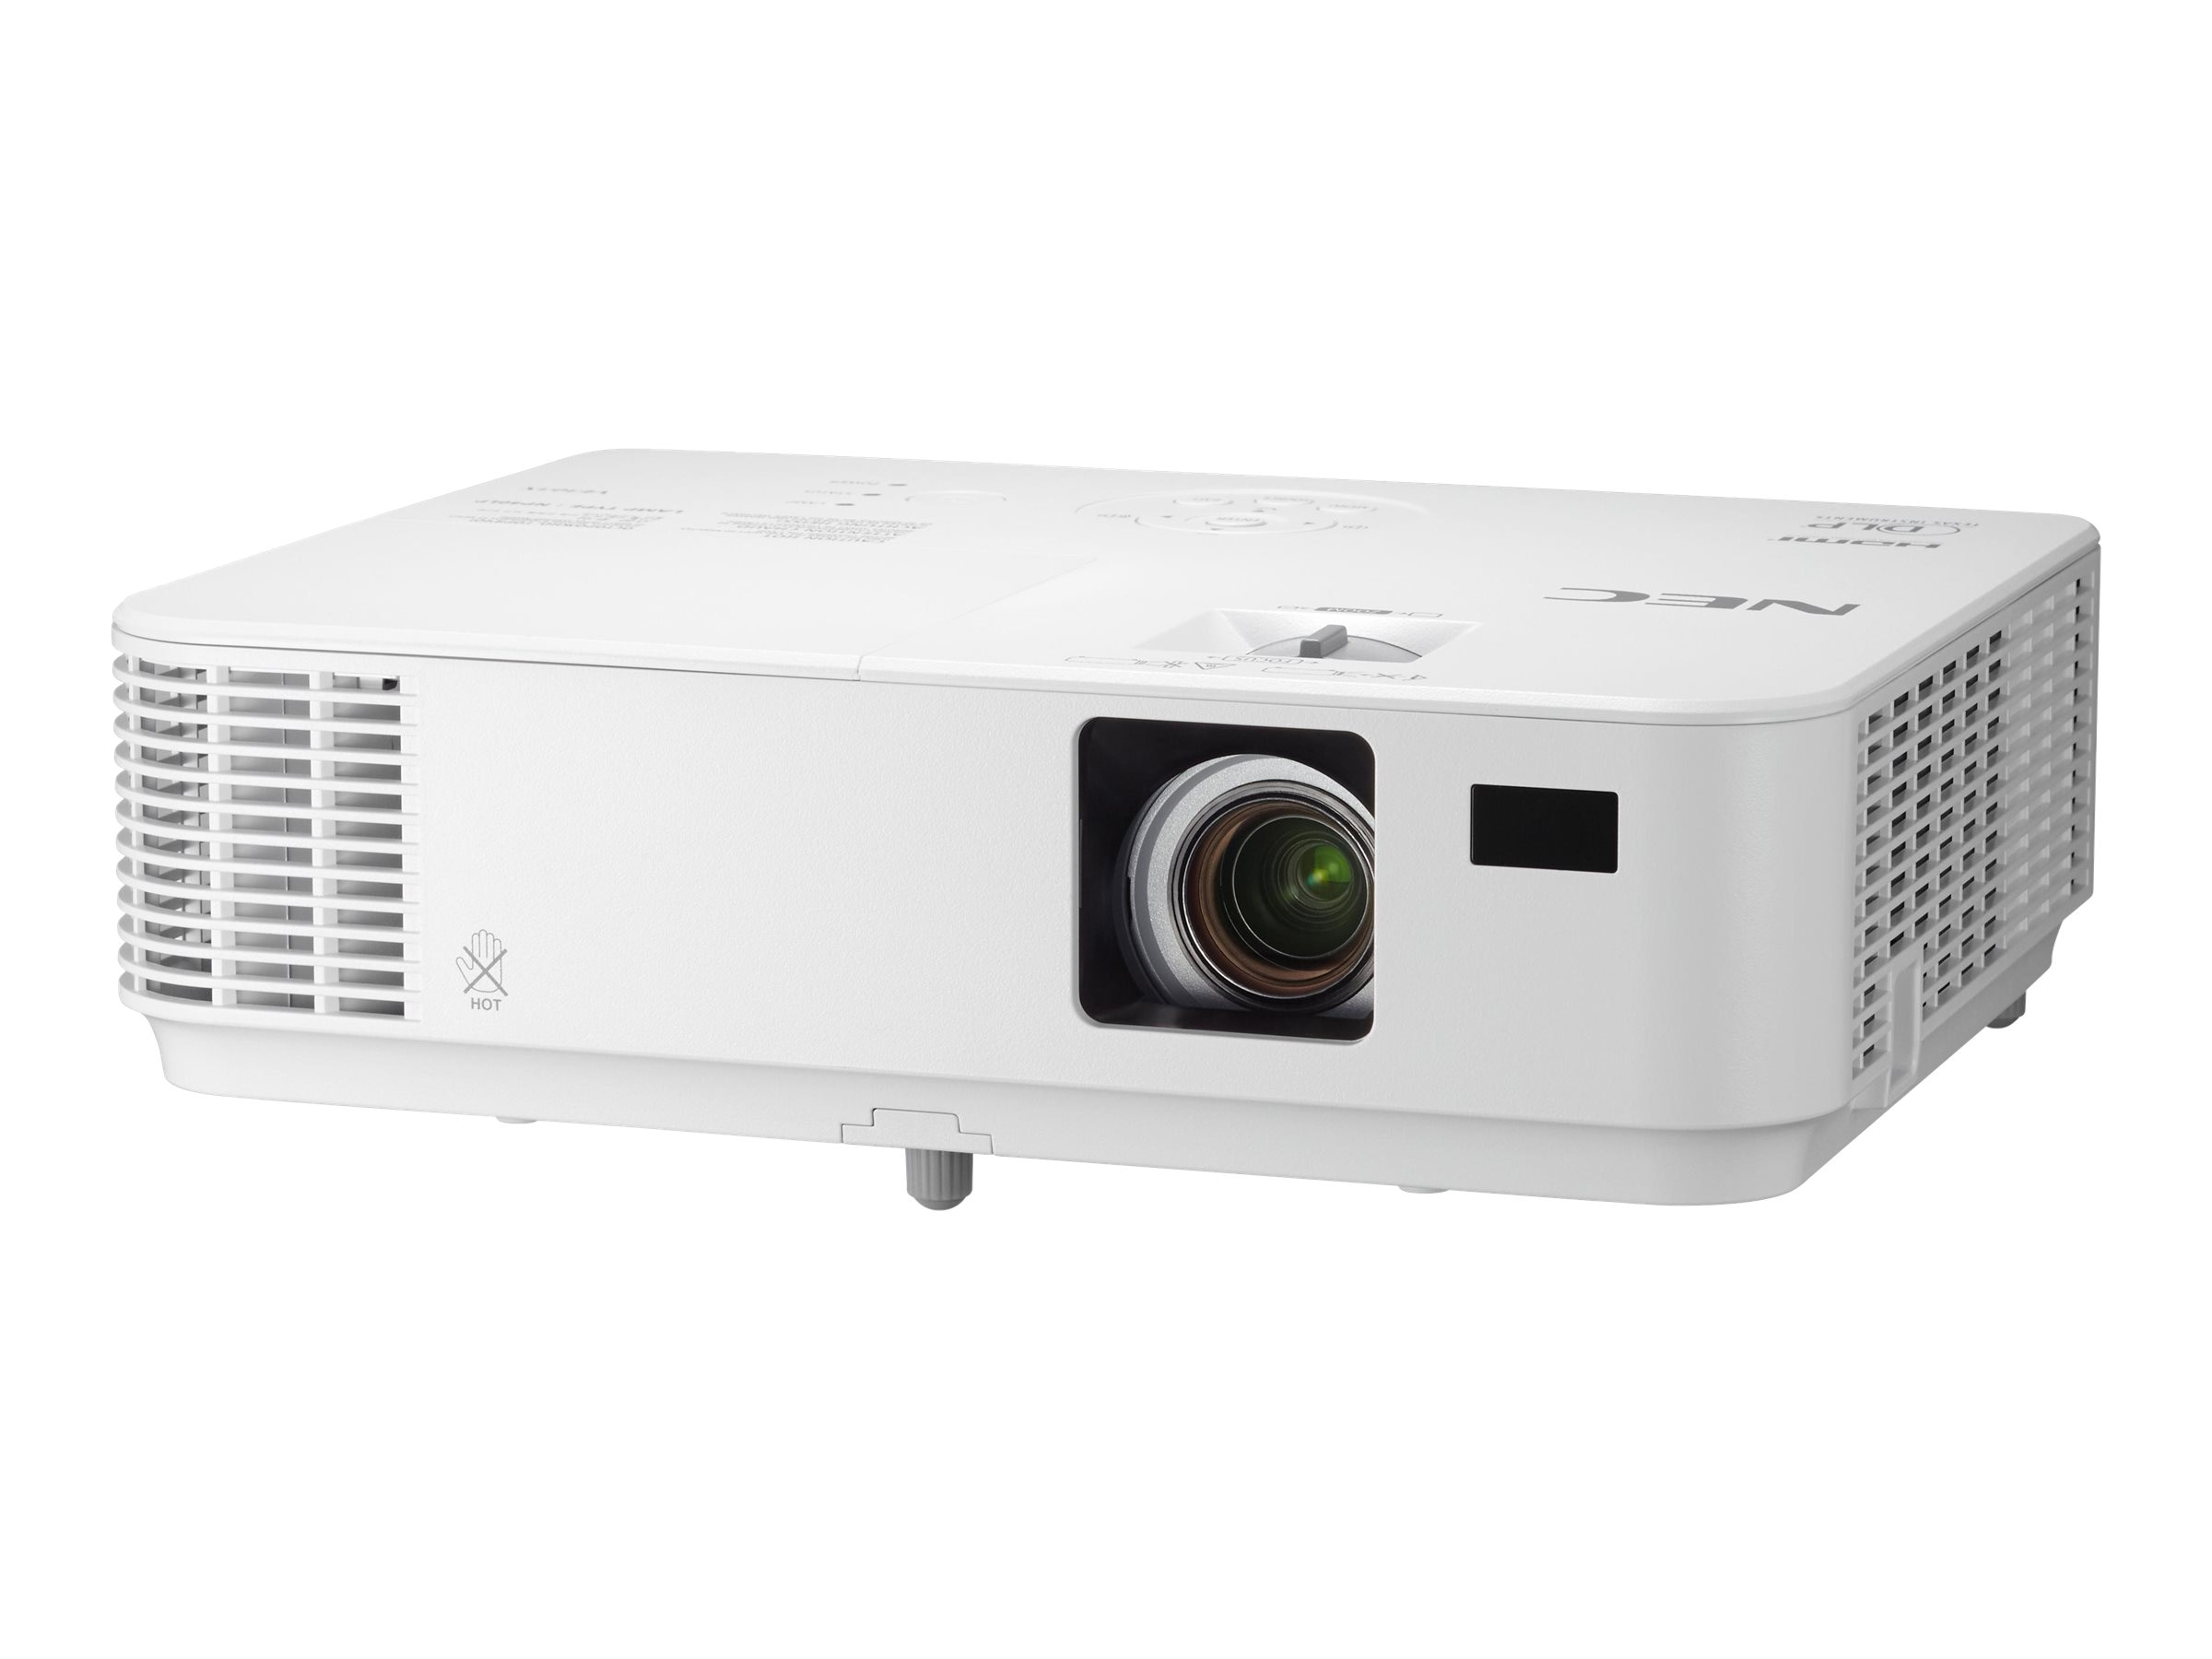 NEC NP-VE303X XGA 3D DLP Projector, 3000 Lumens, White, NP-VE303X, 31863571, Projectors